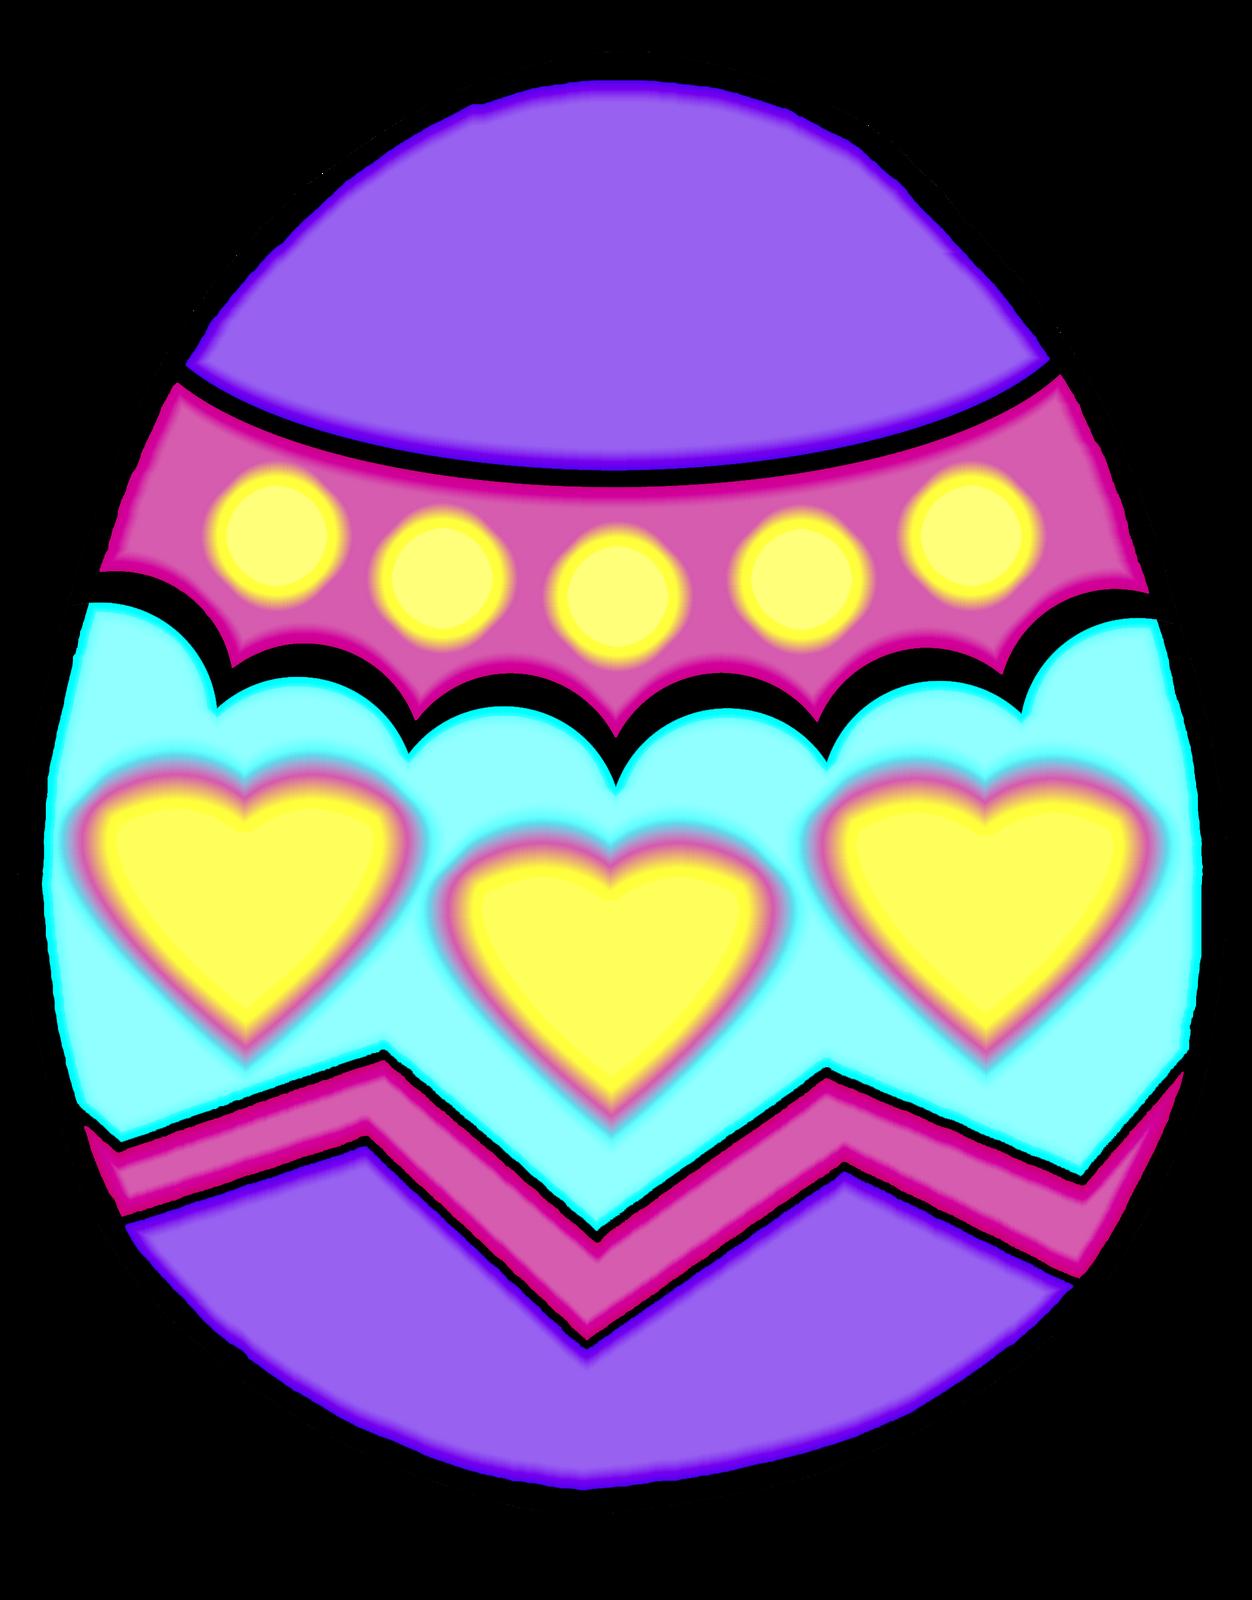 1252x1600 Easter Egg Clip Art Border Clipart Panda